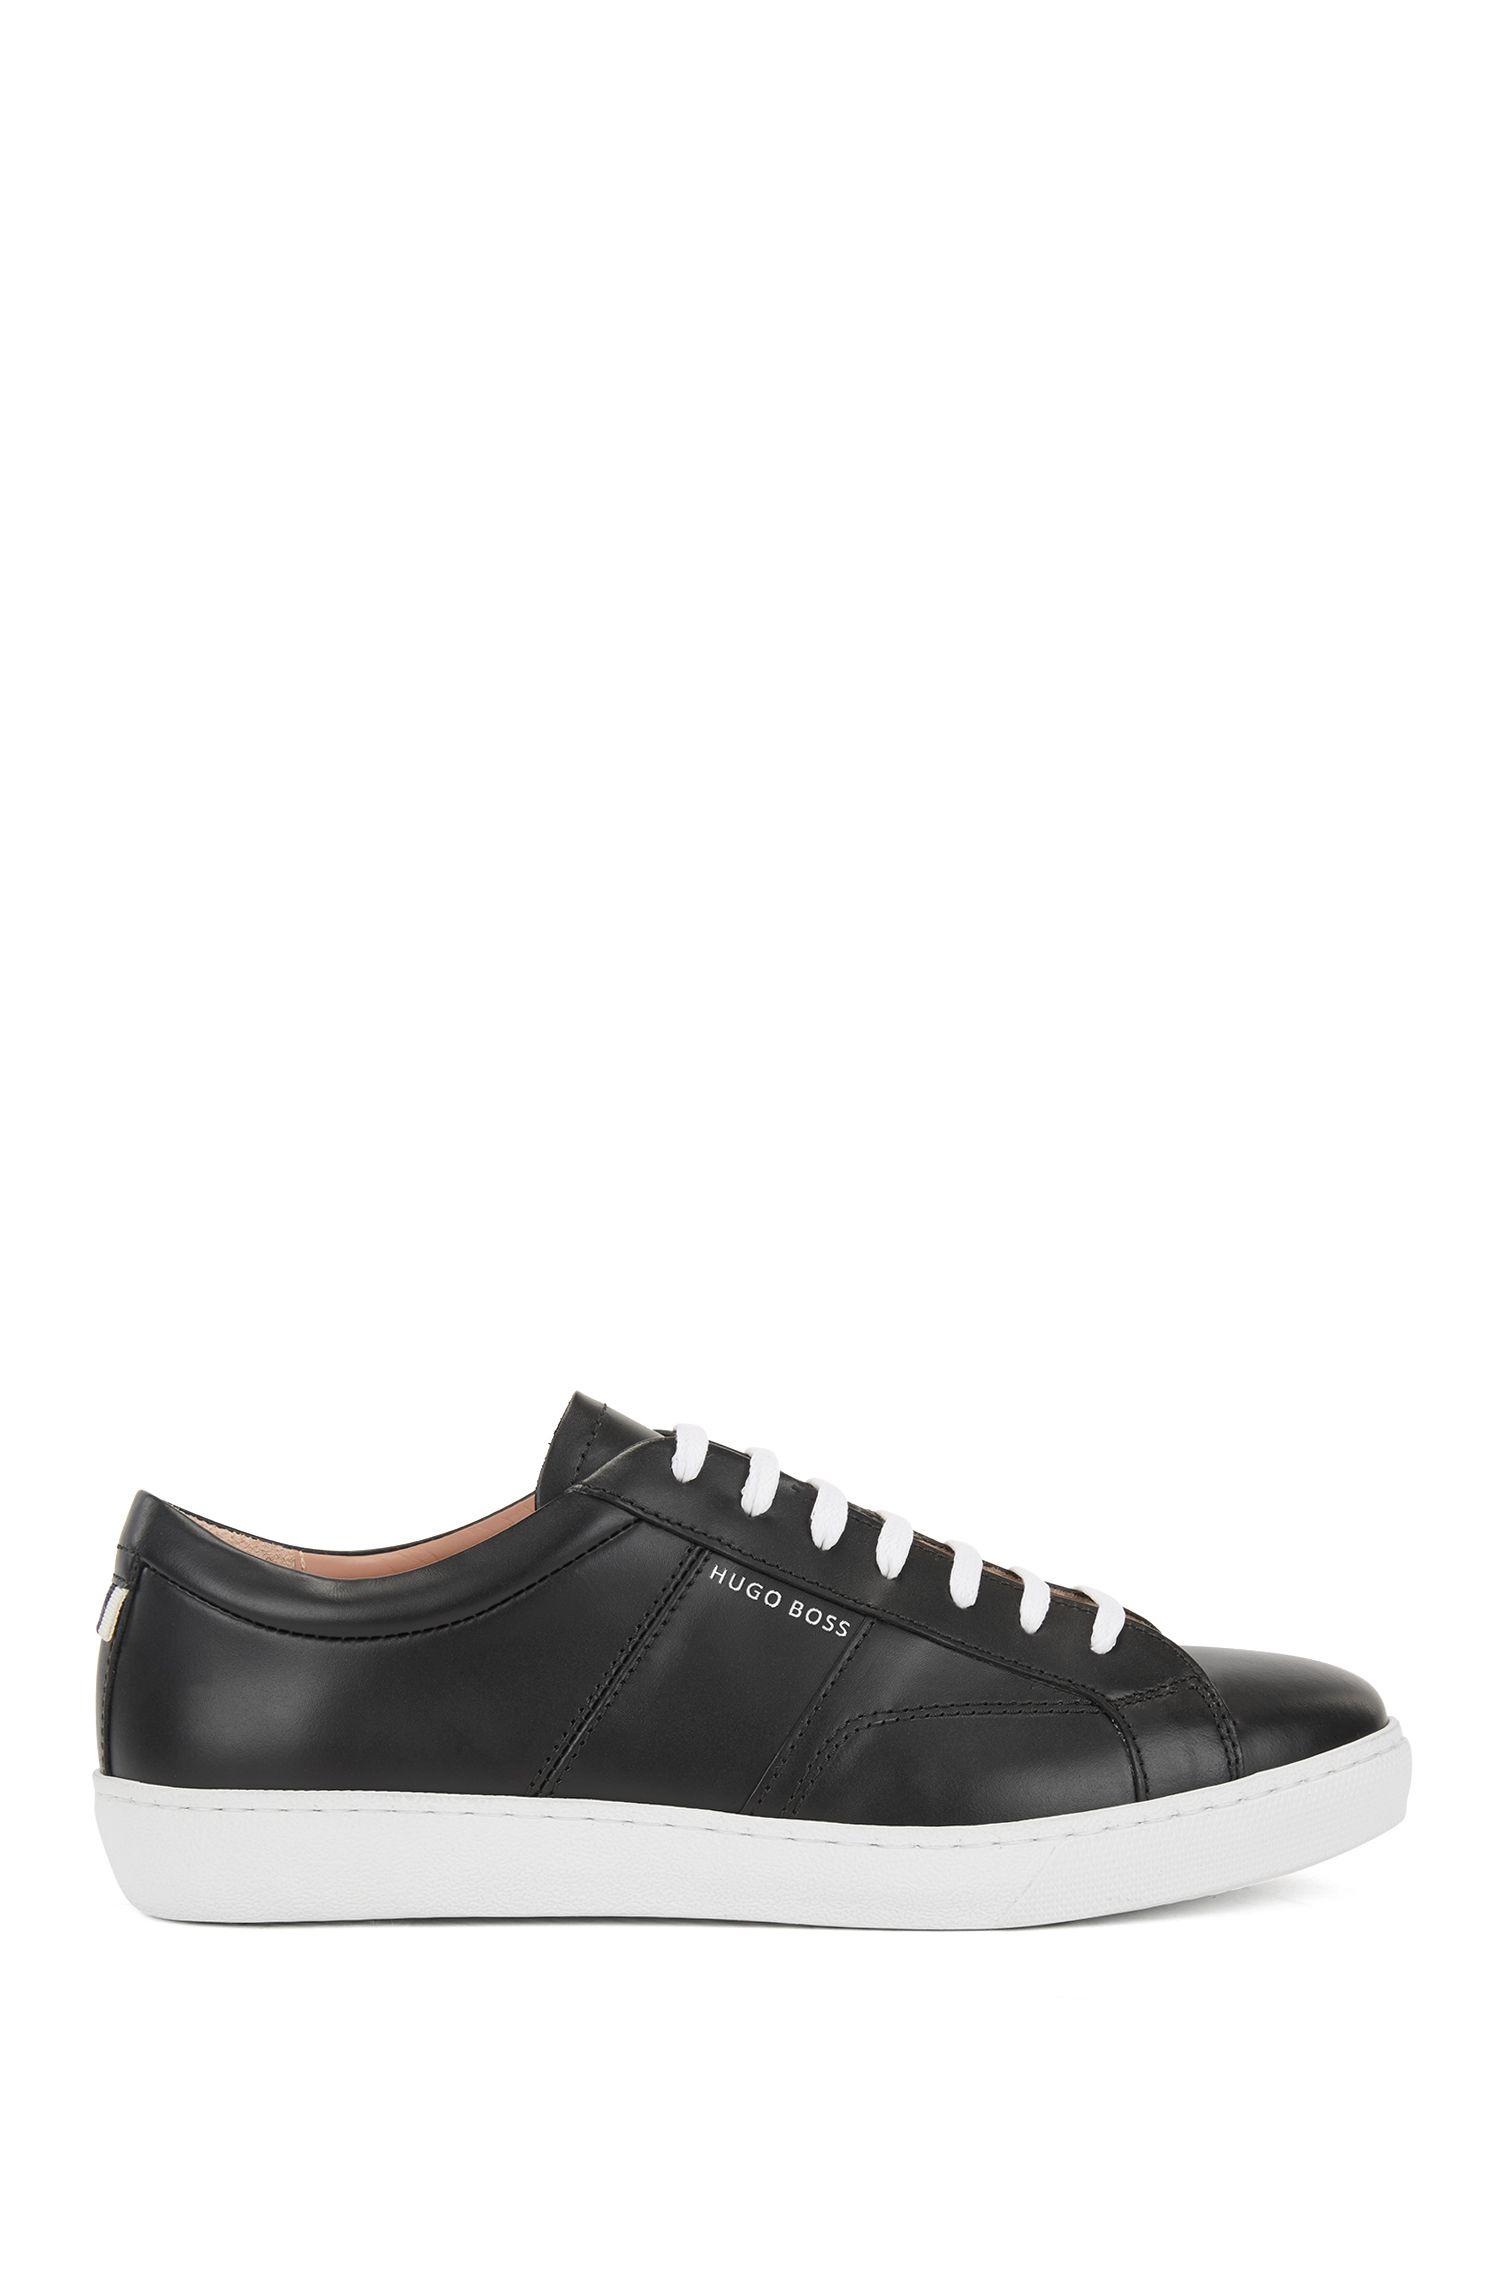 Low-top sneakers in Italian leather